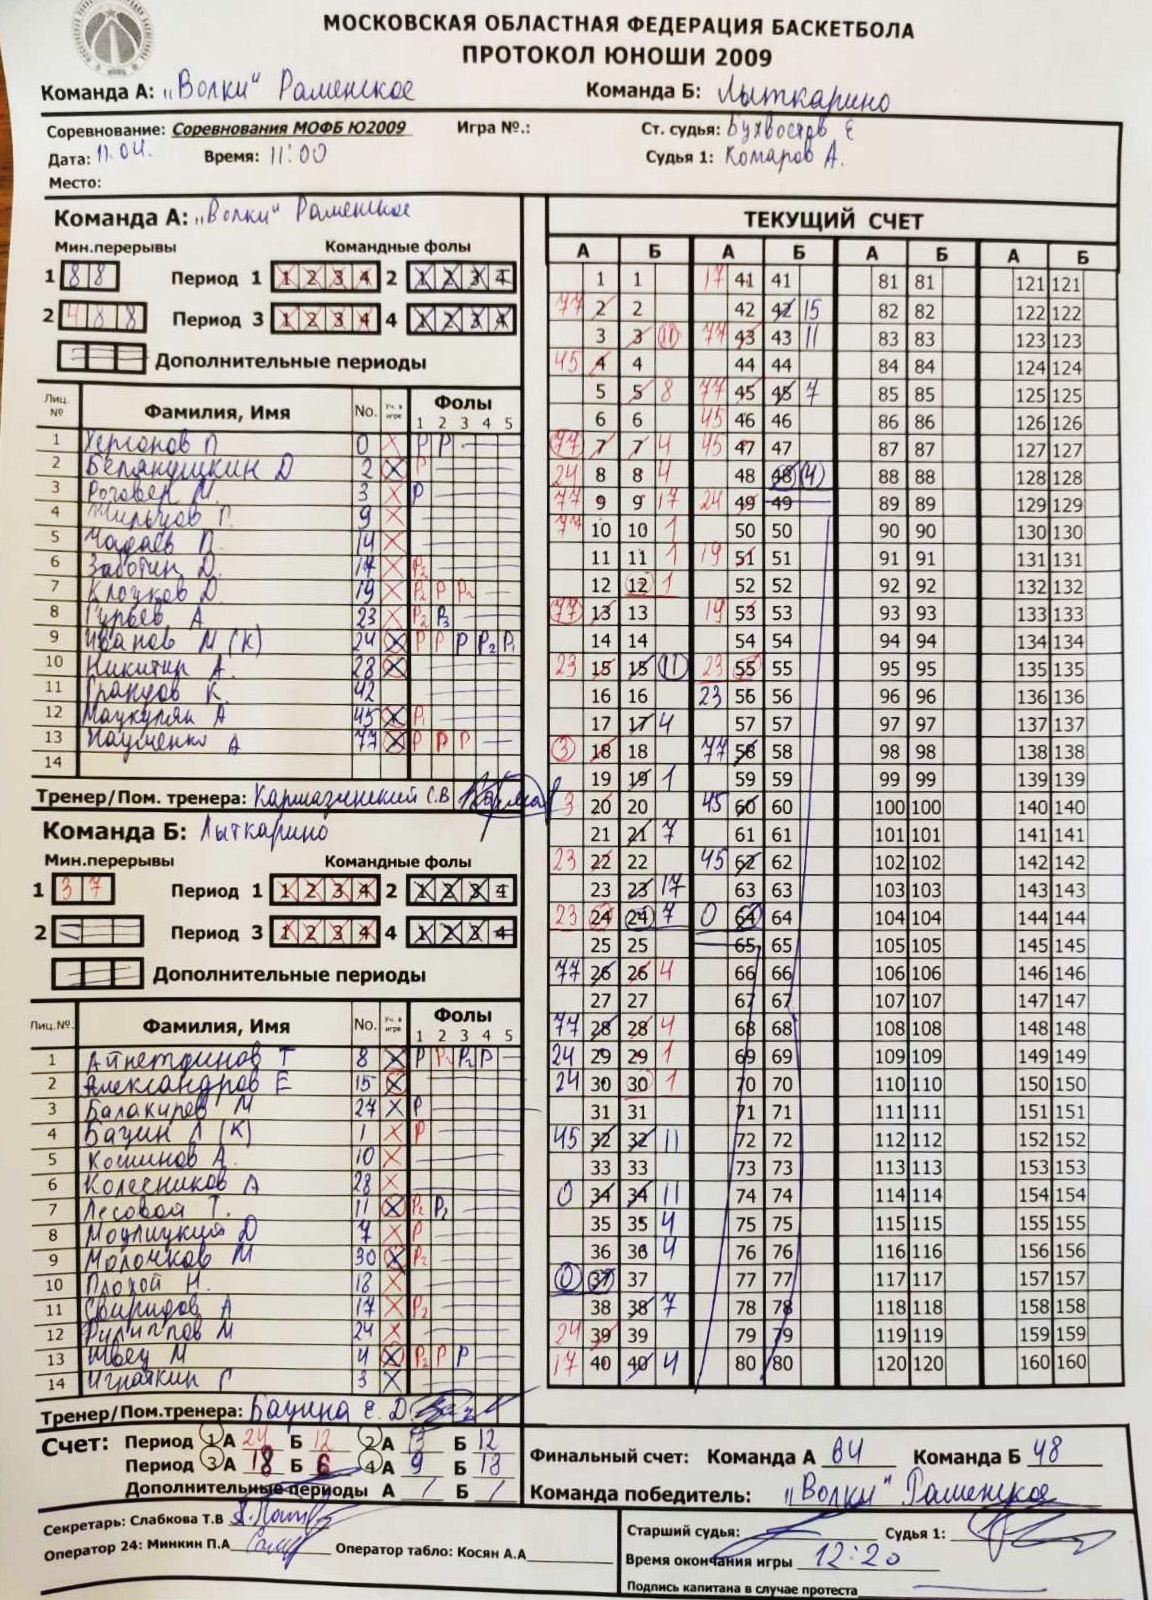 Протокол матча за 3 место Волки - Лыткарино, МО'09, г. Раменское, 11.04.2021